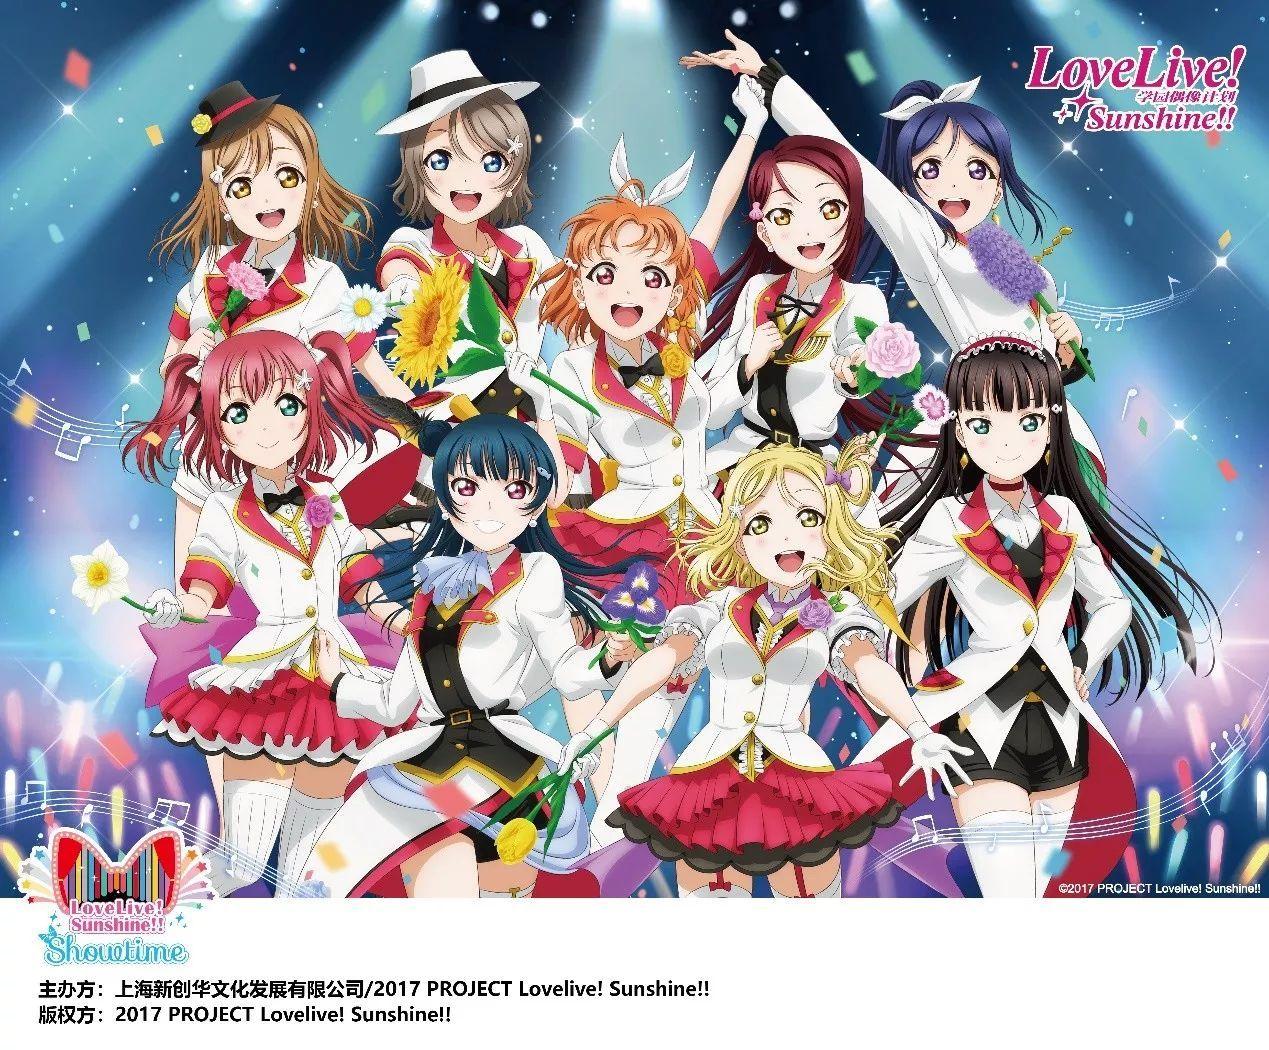 Love Live! Sunshine!!来了!———Love Live! Sunshine!! Showtime企划展开幕仪式-ANICOGA